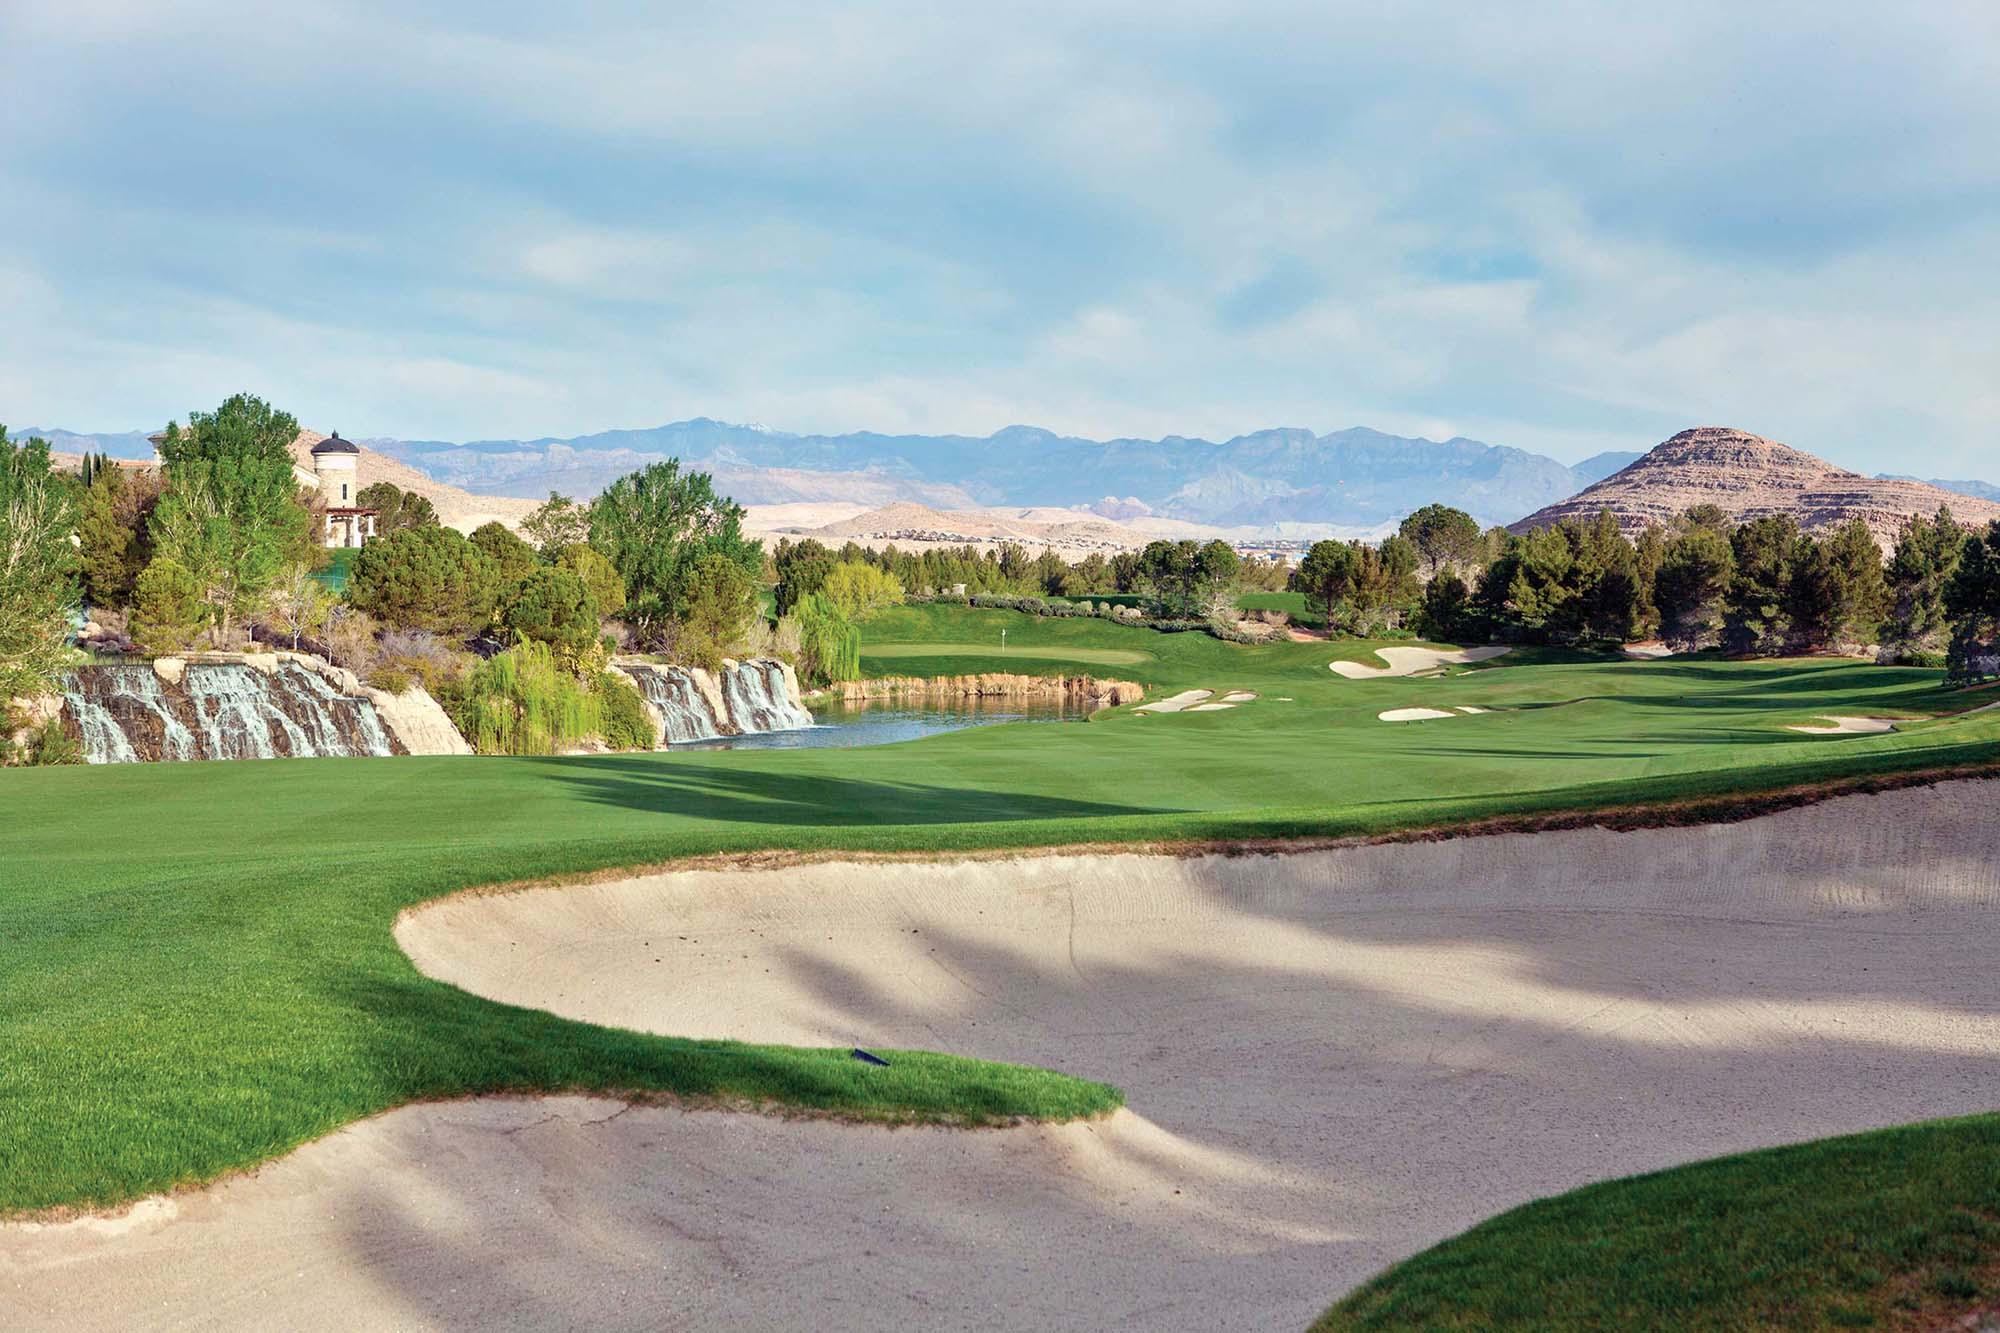 Southern Highlands Golf Club's third hole